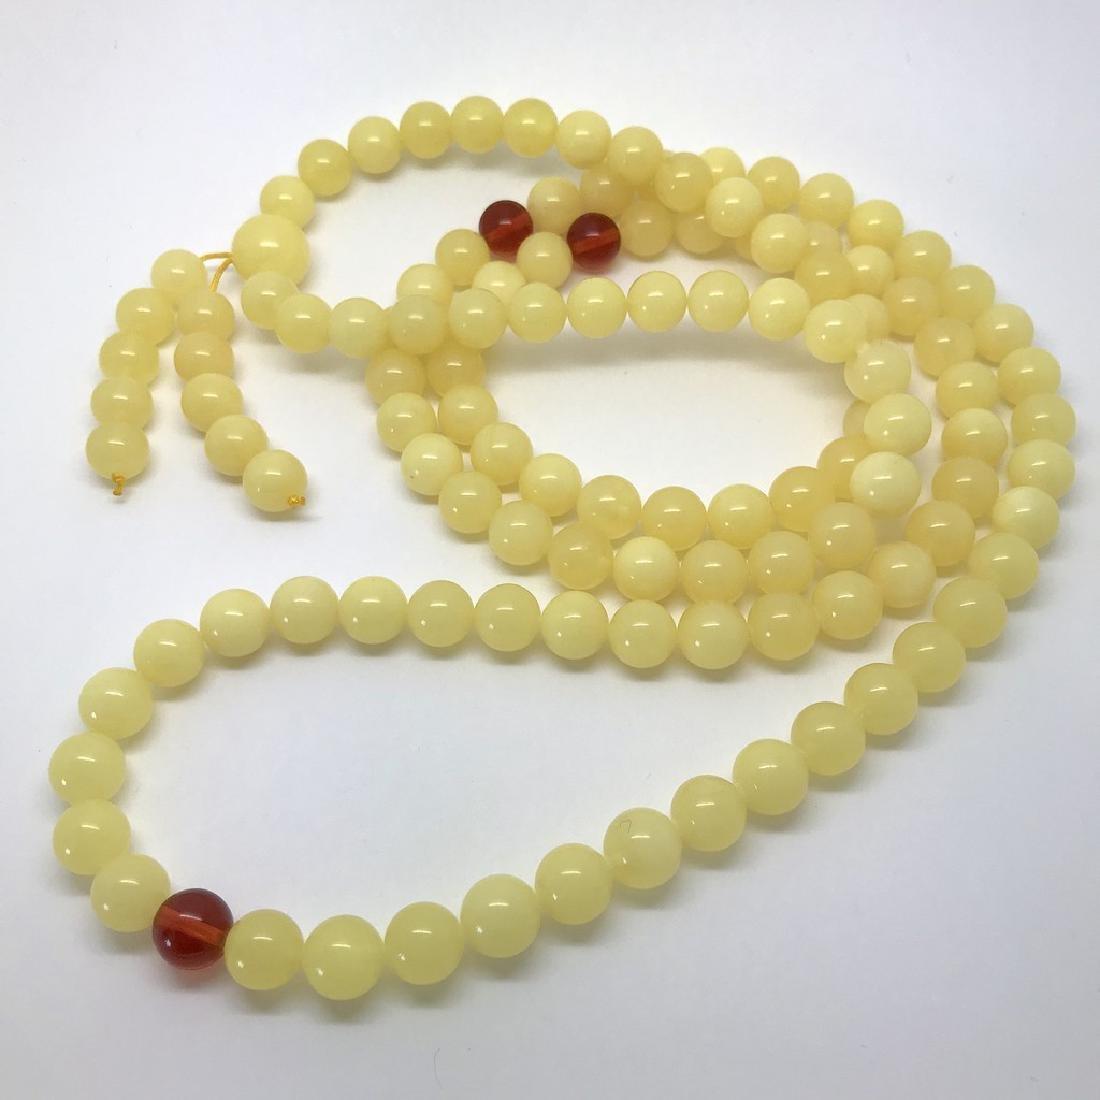 Tibetan japa mala Baltic amber white 108 beads ø10mm 75 - 6